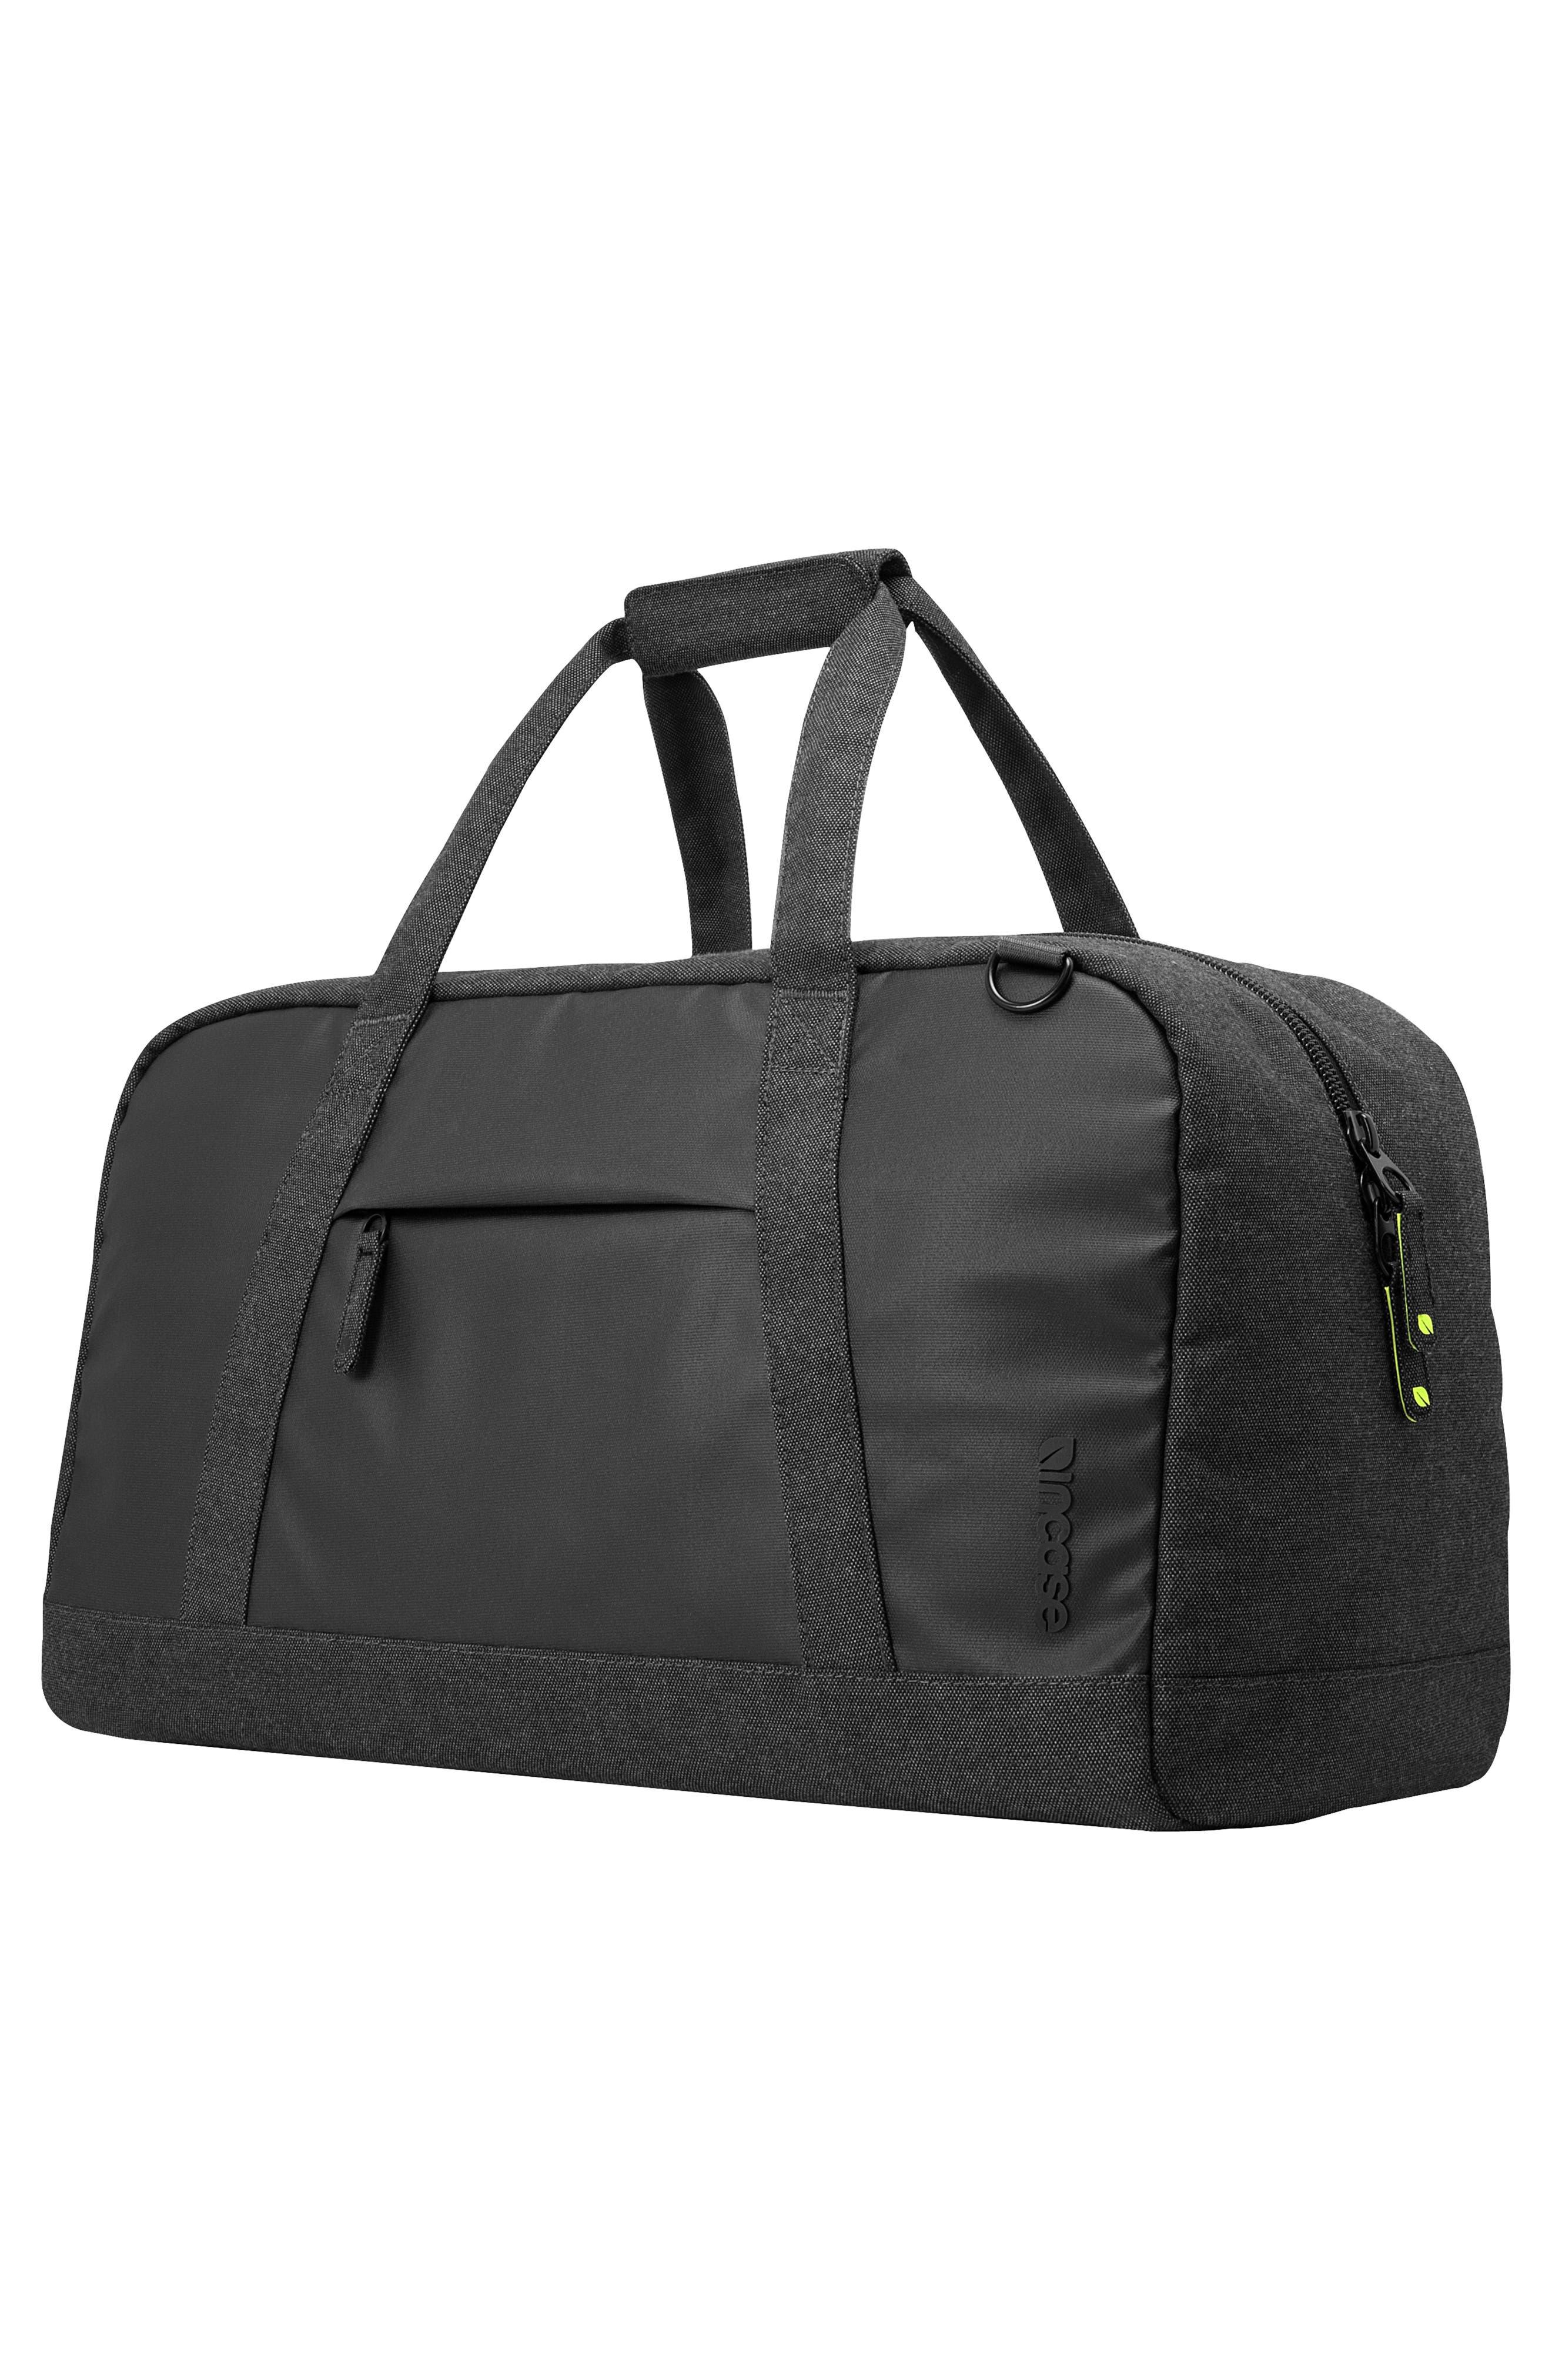 INCASE DESIGNS,                             EO Duffel Bag,                             Alternate thumbnail 2, color,                             BLACK